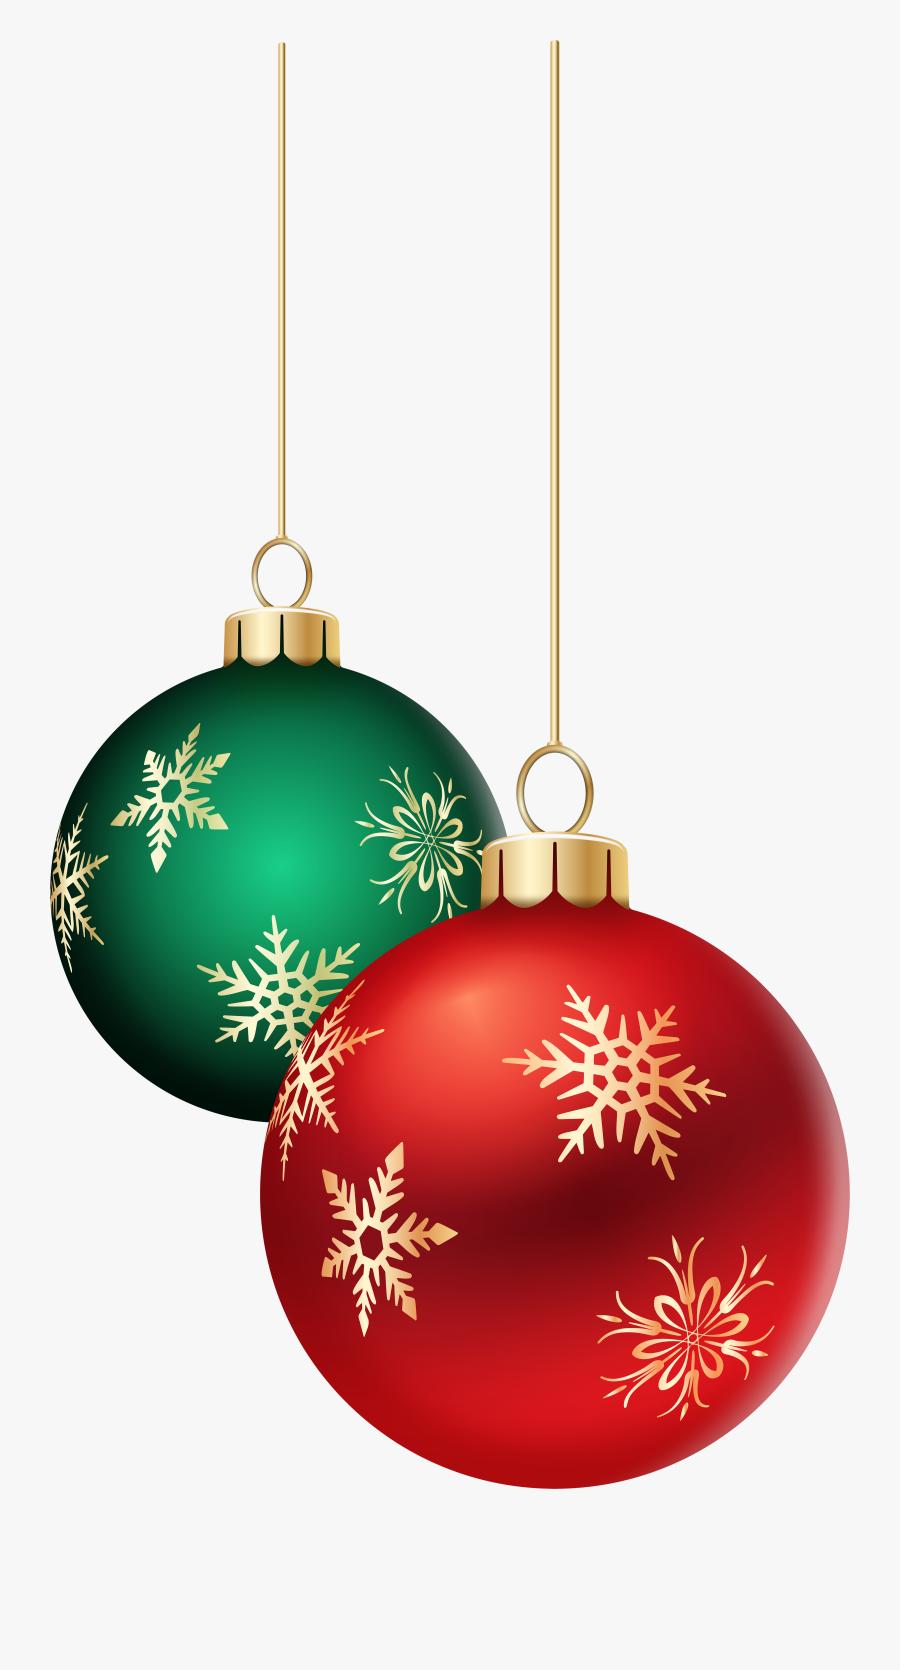 Christmas Ornament Christmas Decoration Christmas Lights - Hanging Christmas Balls Transparent, Transparent Clipart